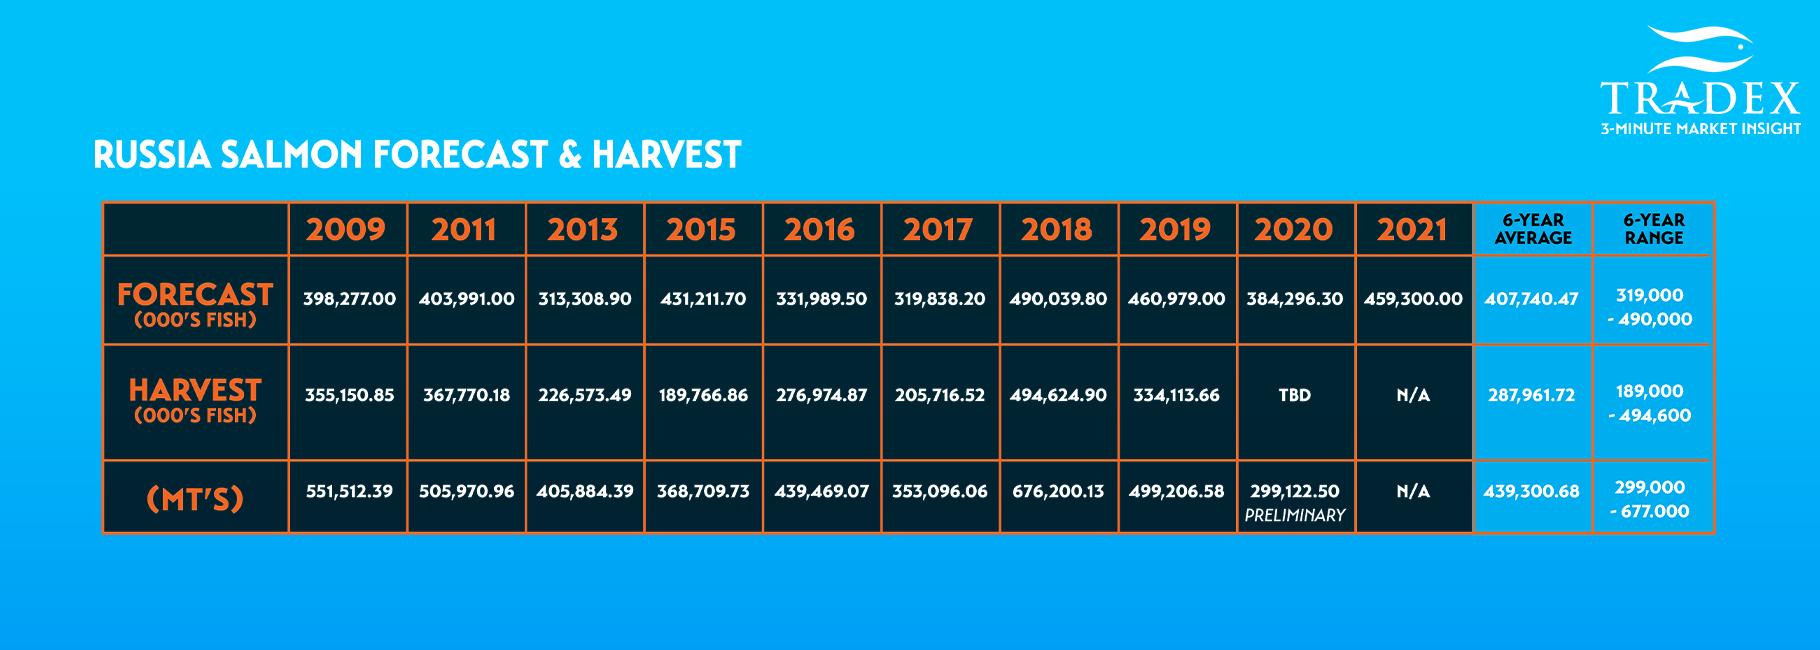 RUSSIA Salmon Forecast & Harvest